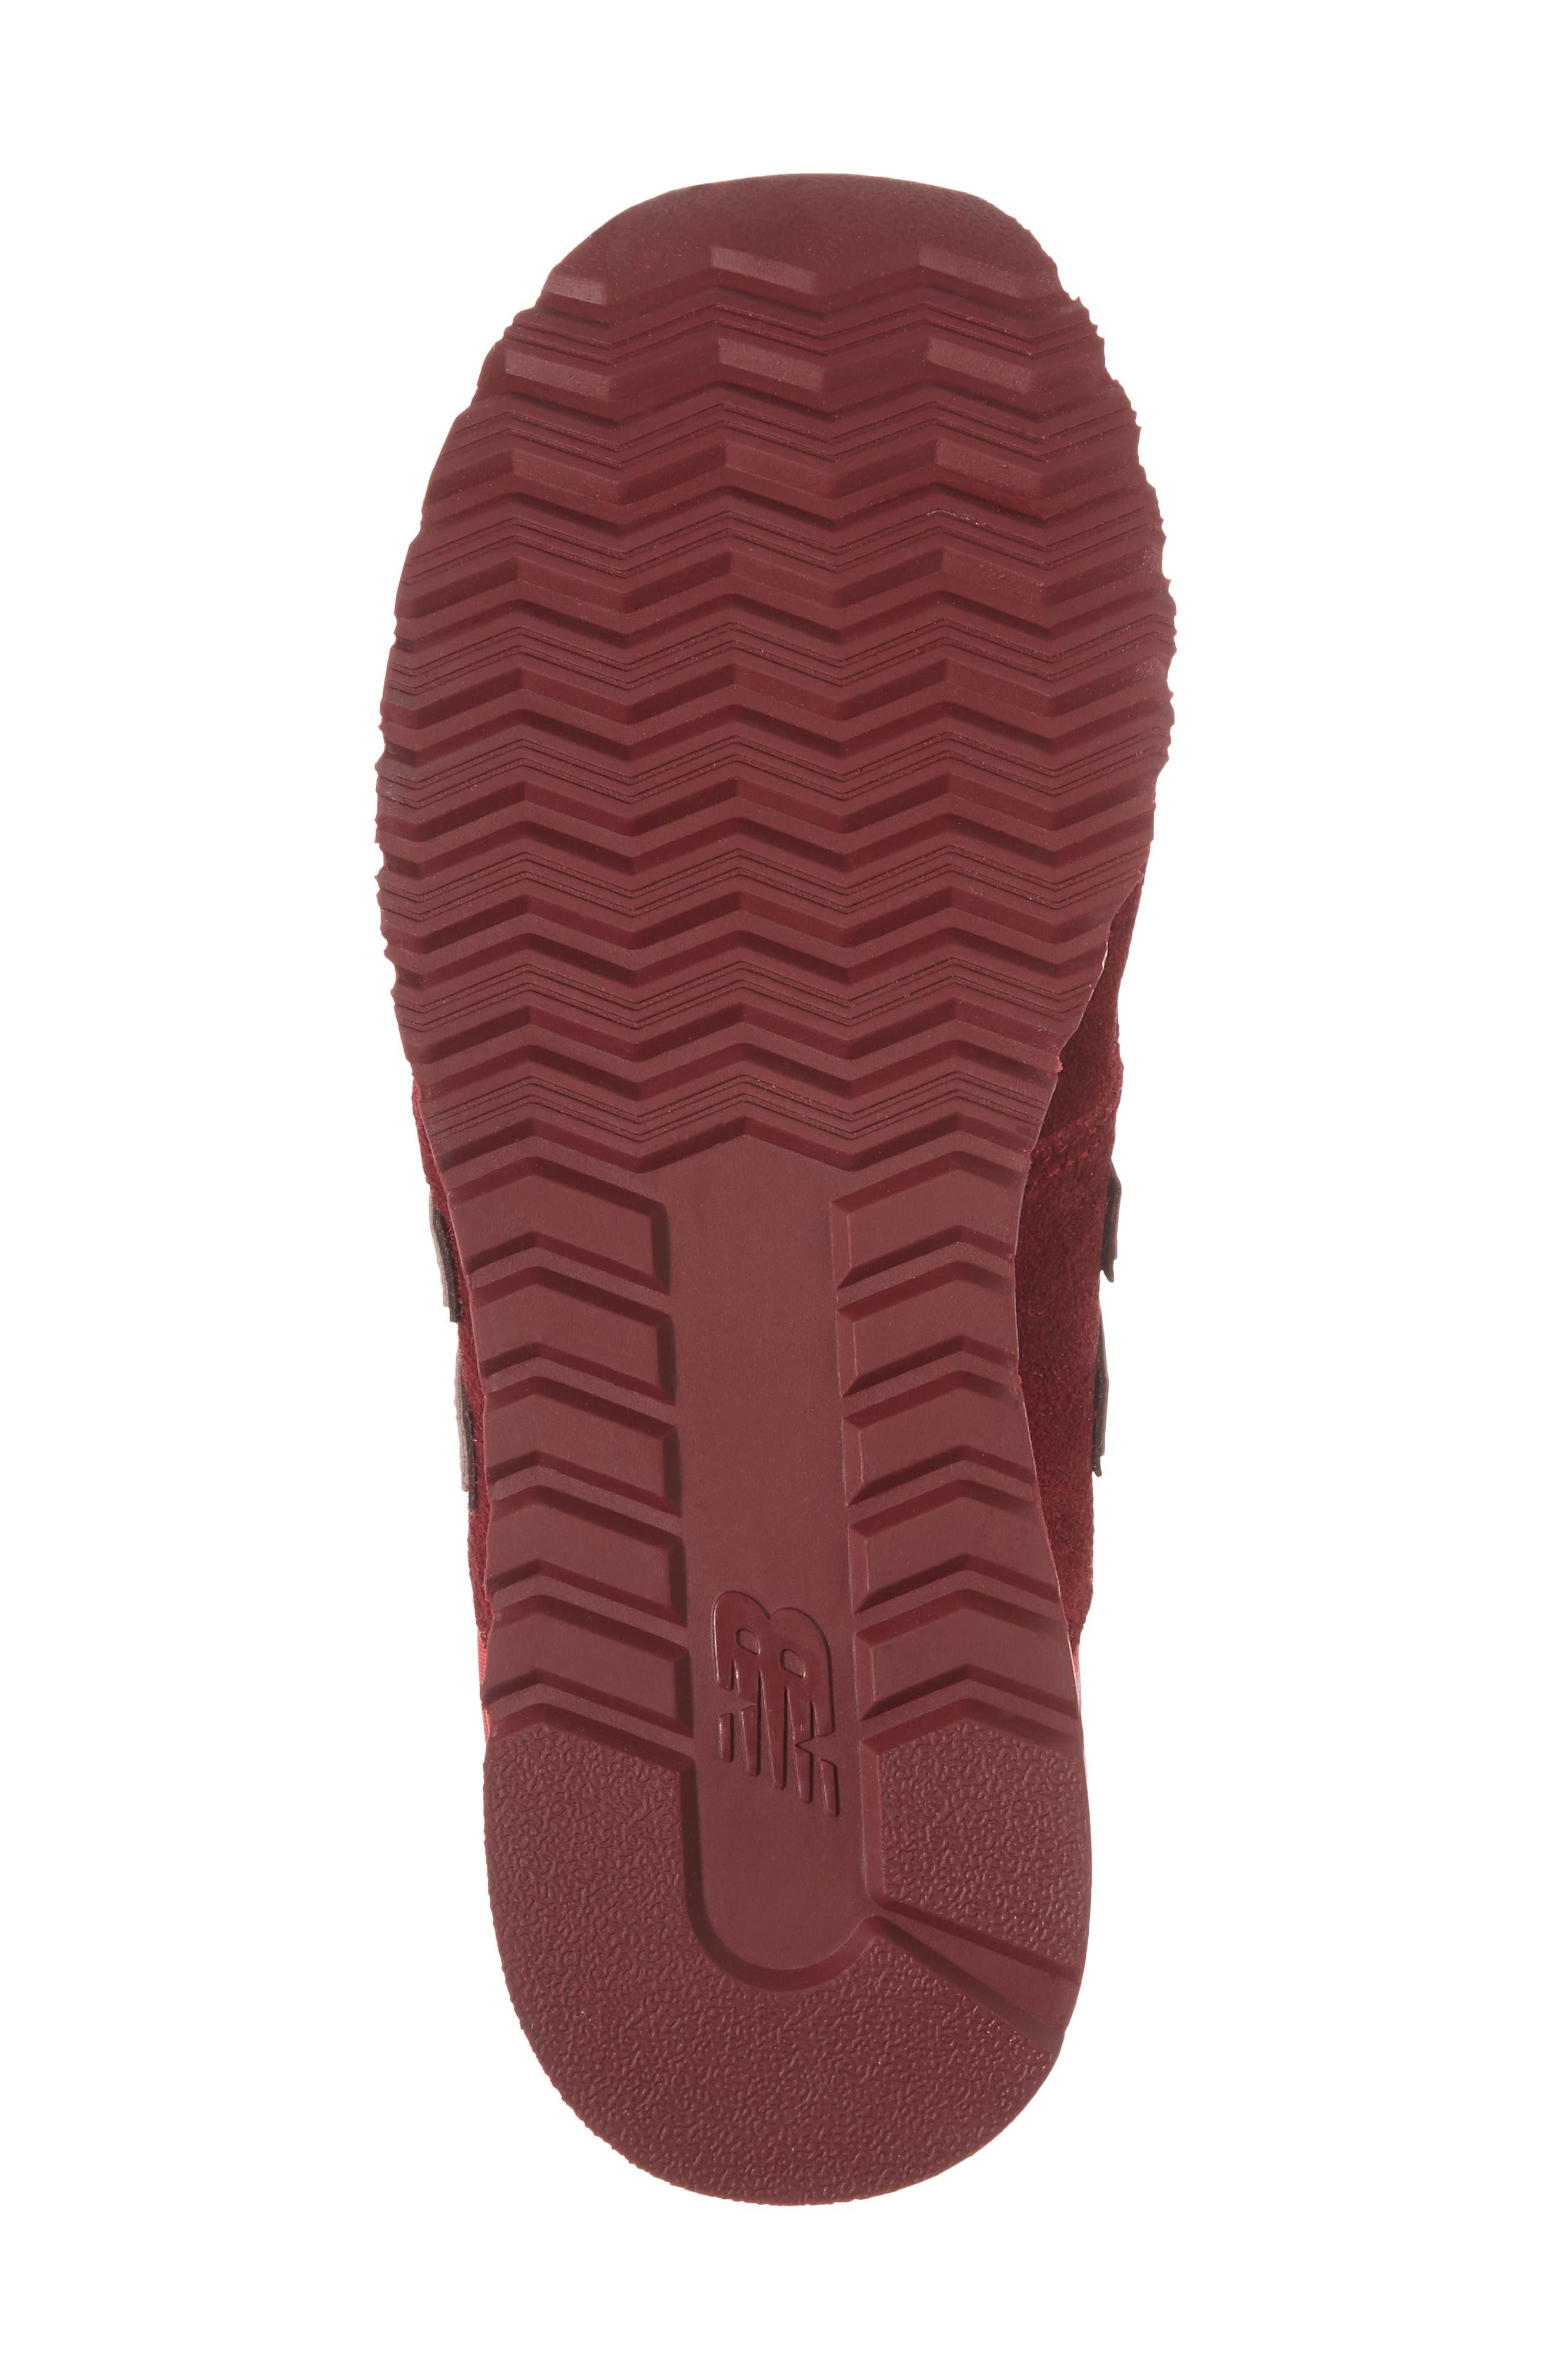 520 Sneaker,                             Alternate thumbnail 6, color,                             Pink/ Purple